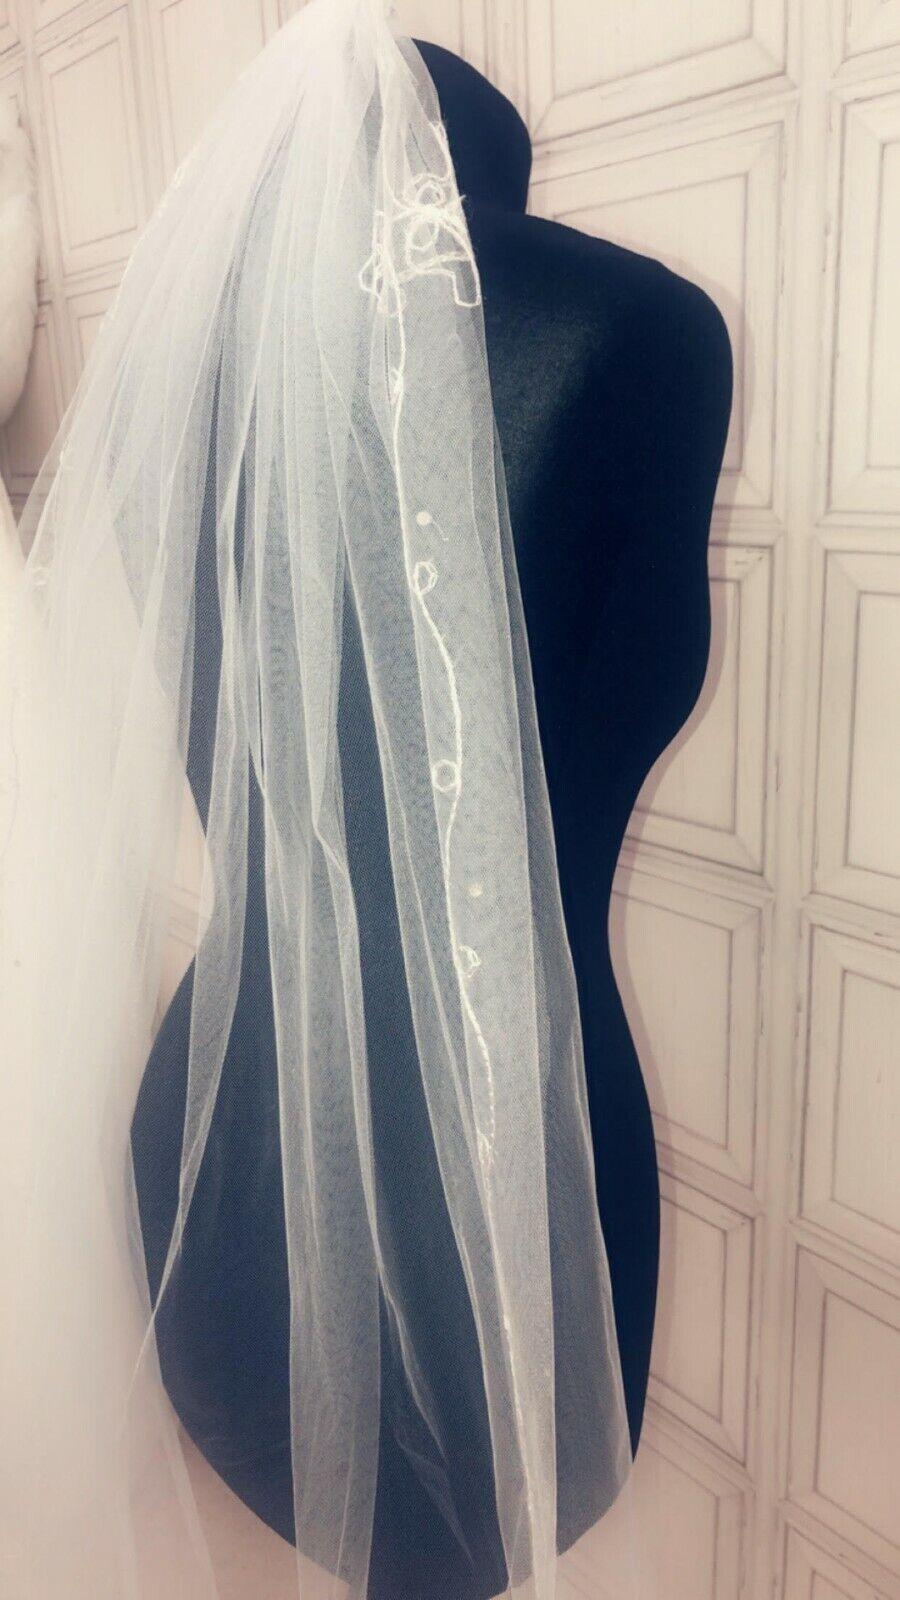 New 1 Tier Knee Length White Ivory Flower Lace Bridal Wedding Uk